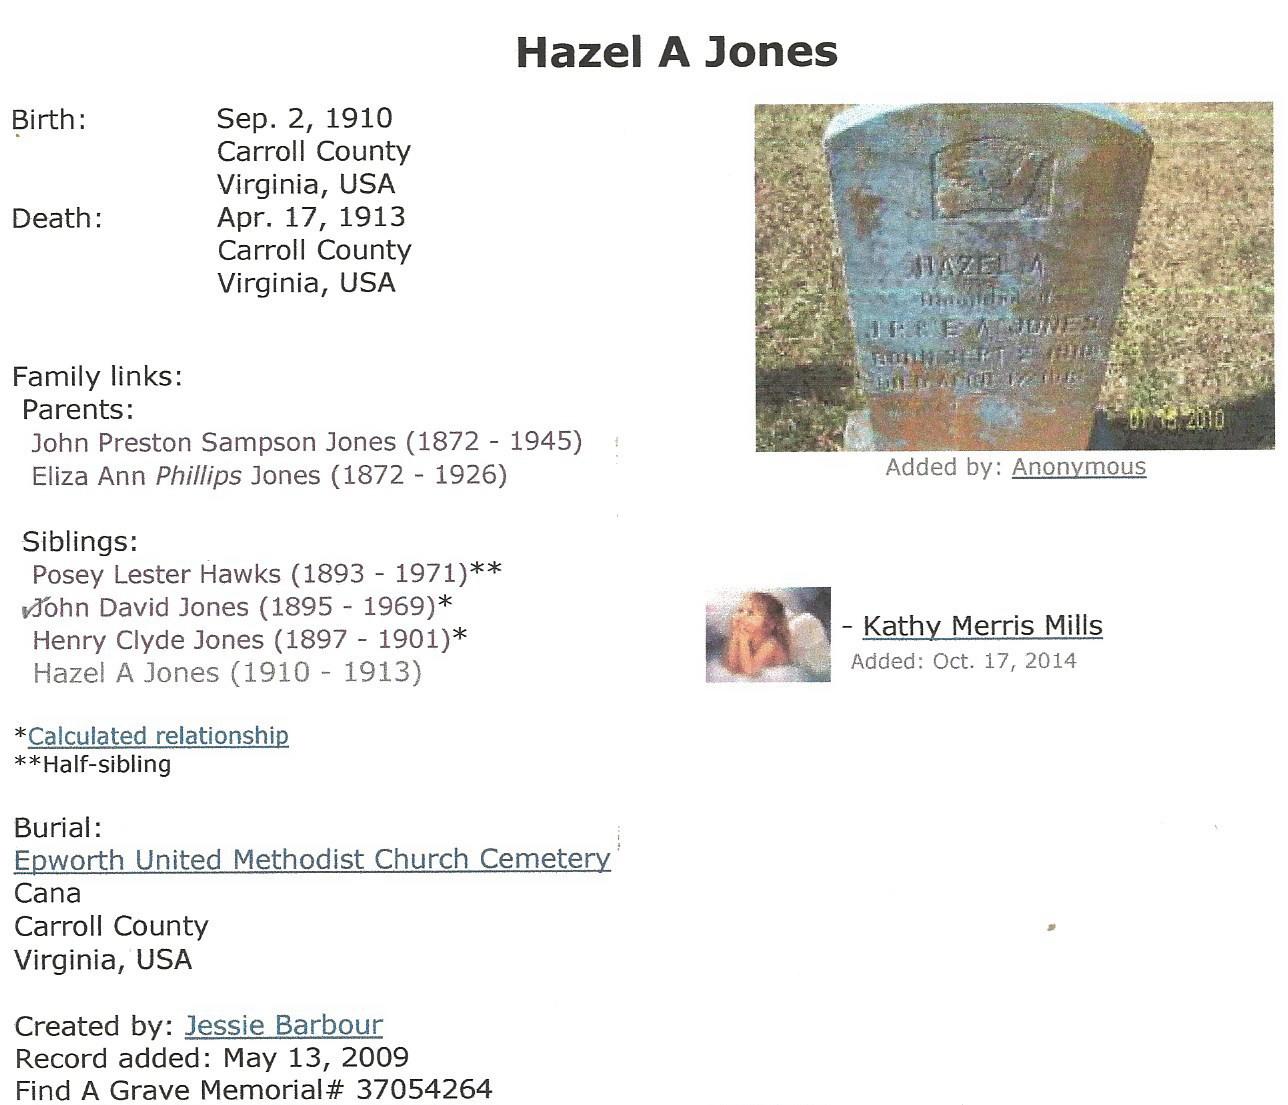 Hazel A. Jones